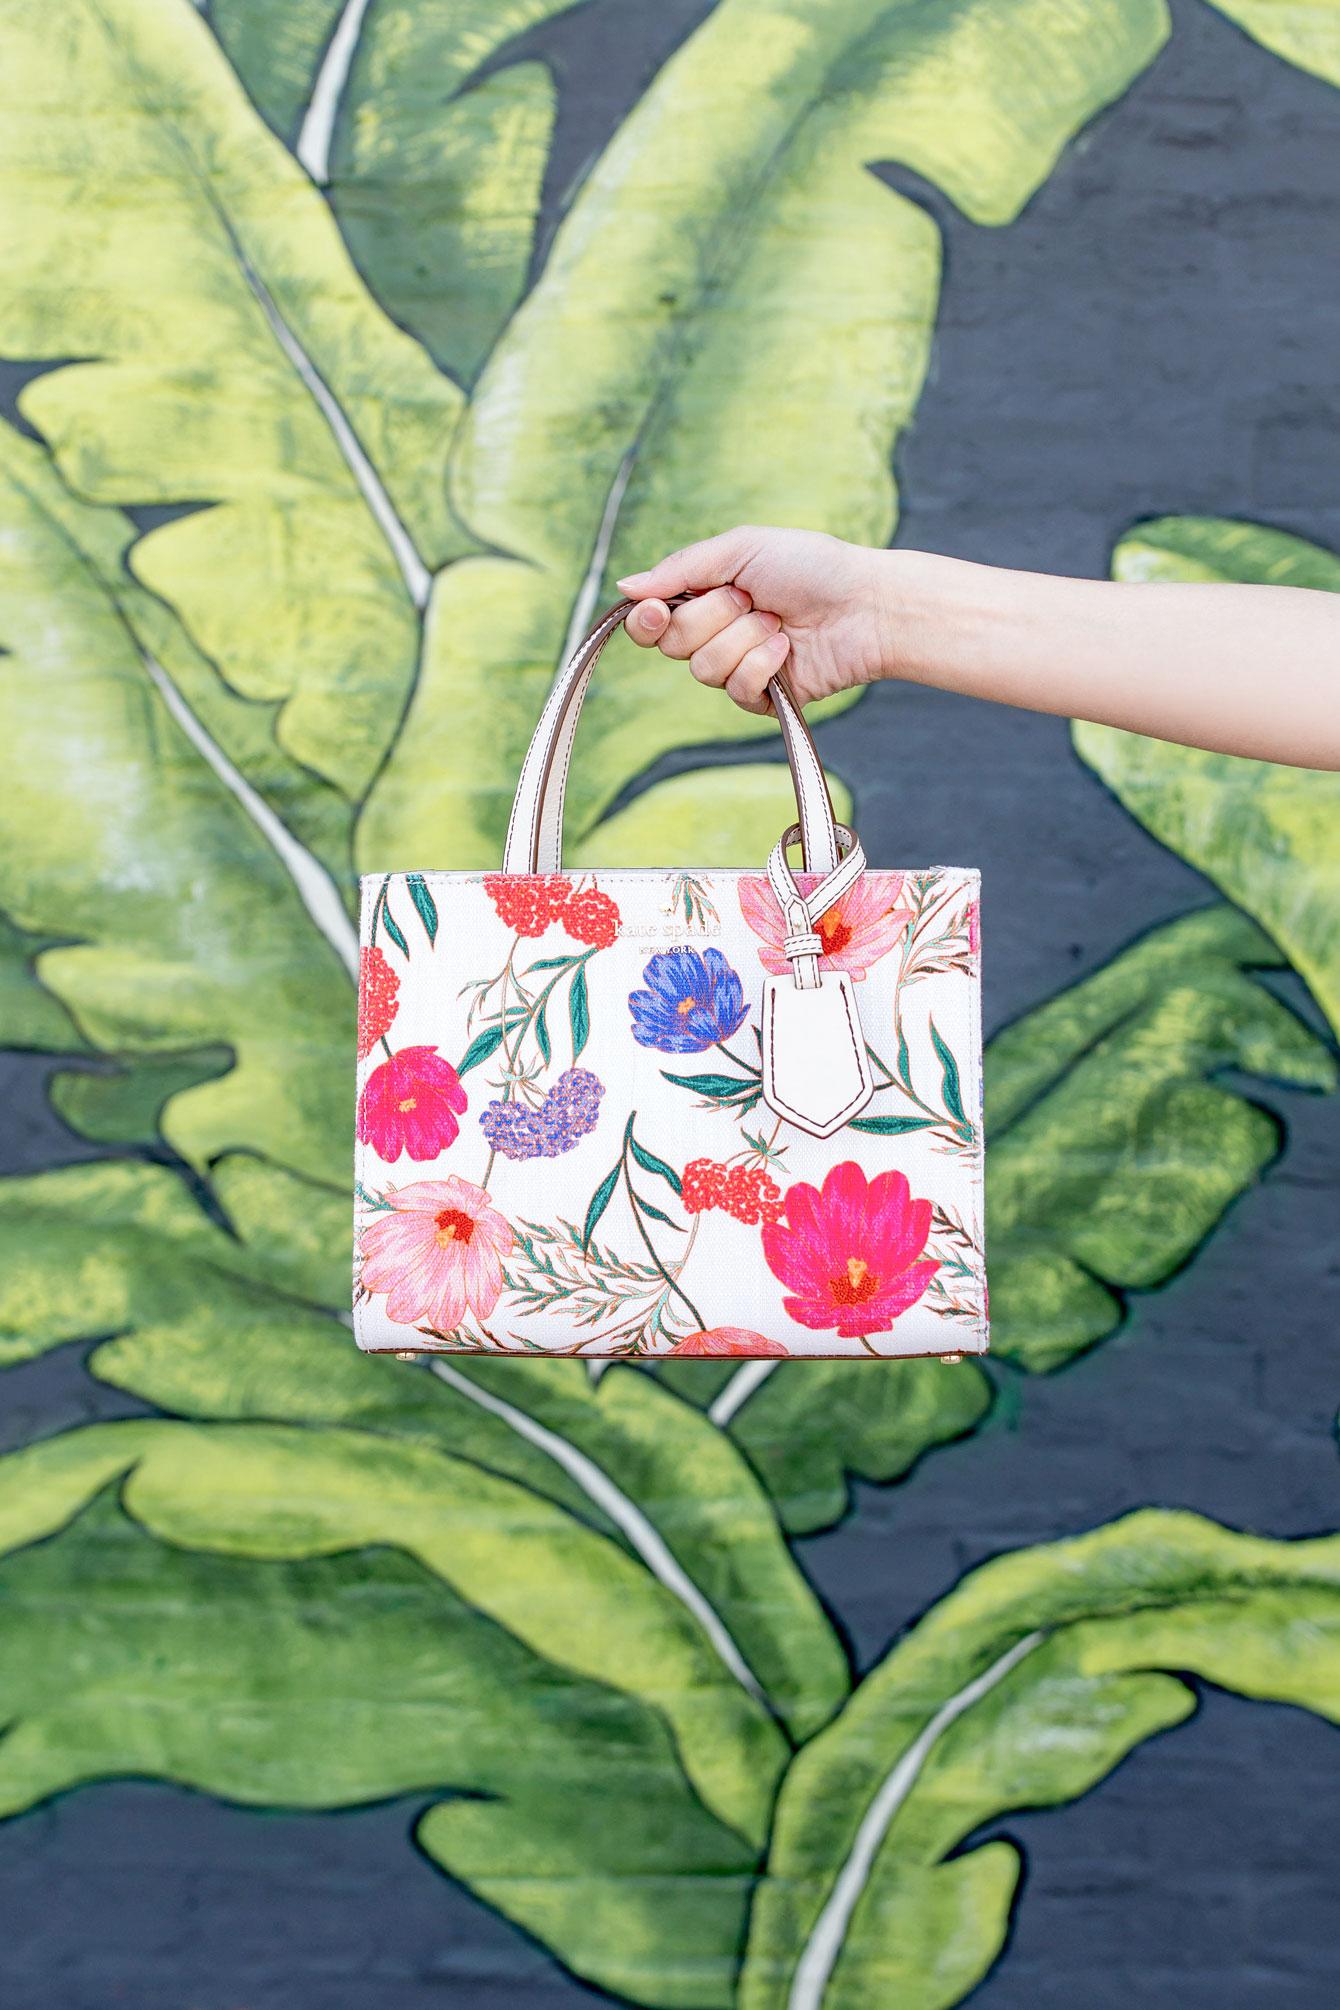 Kate Spade Thompson Street Floral Sam Bag